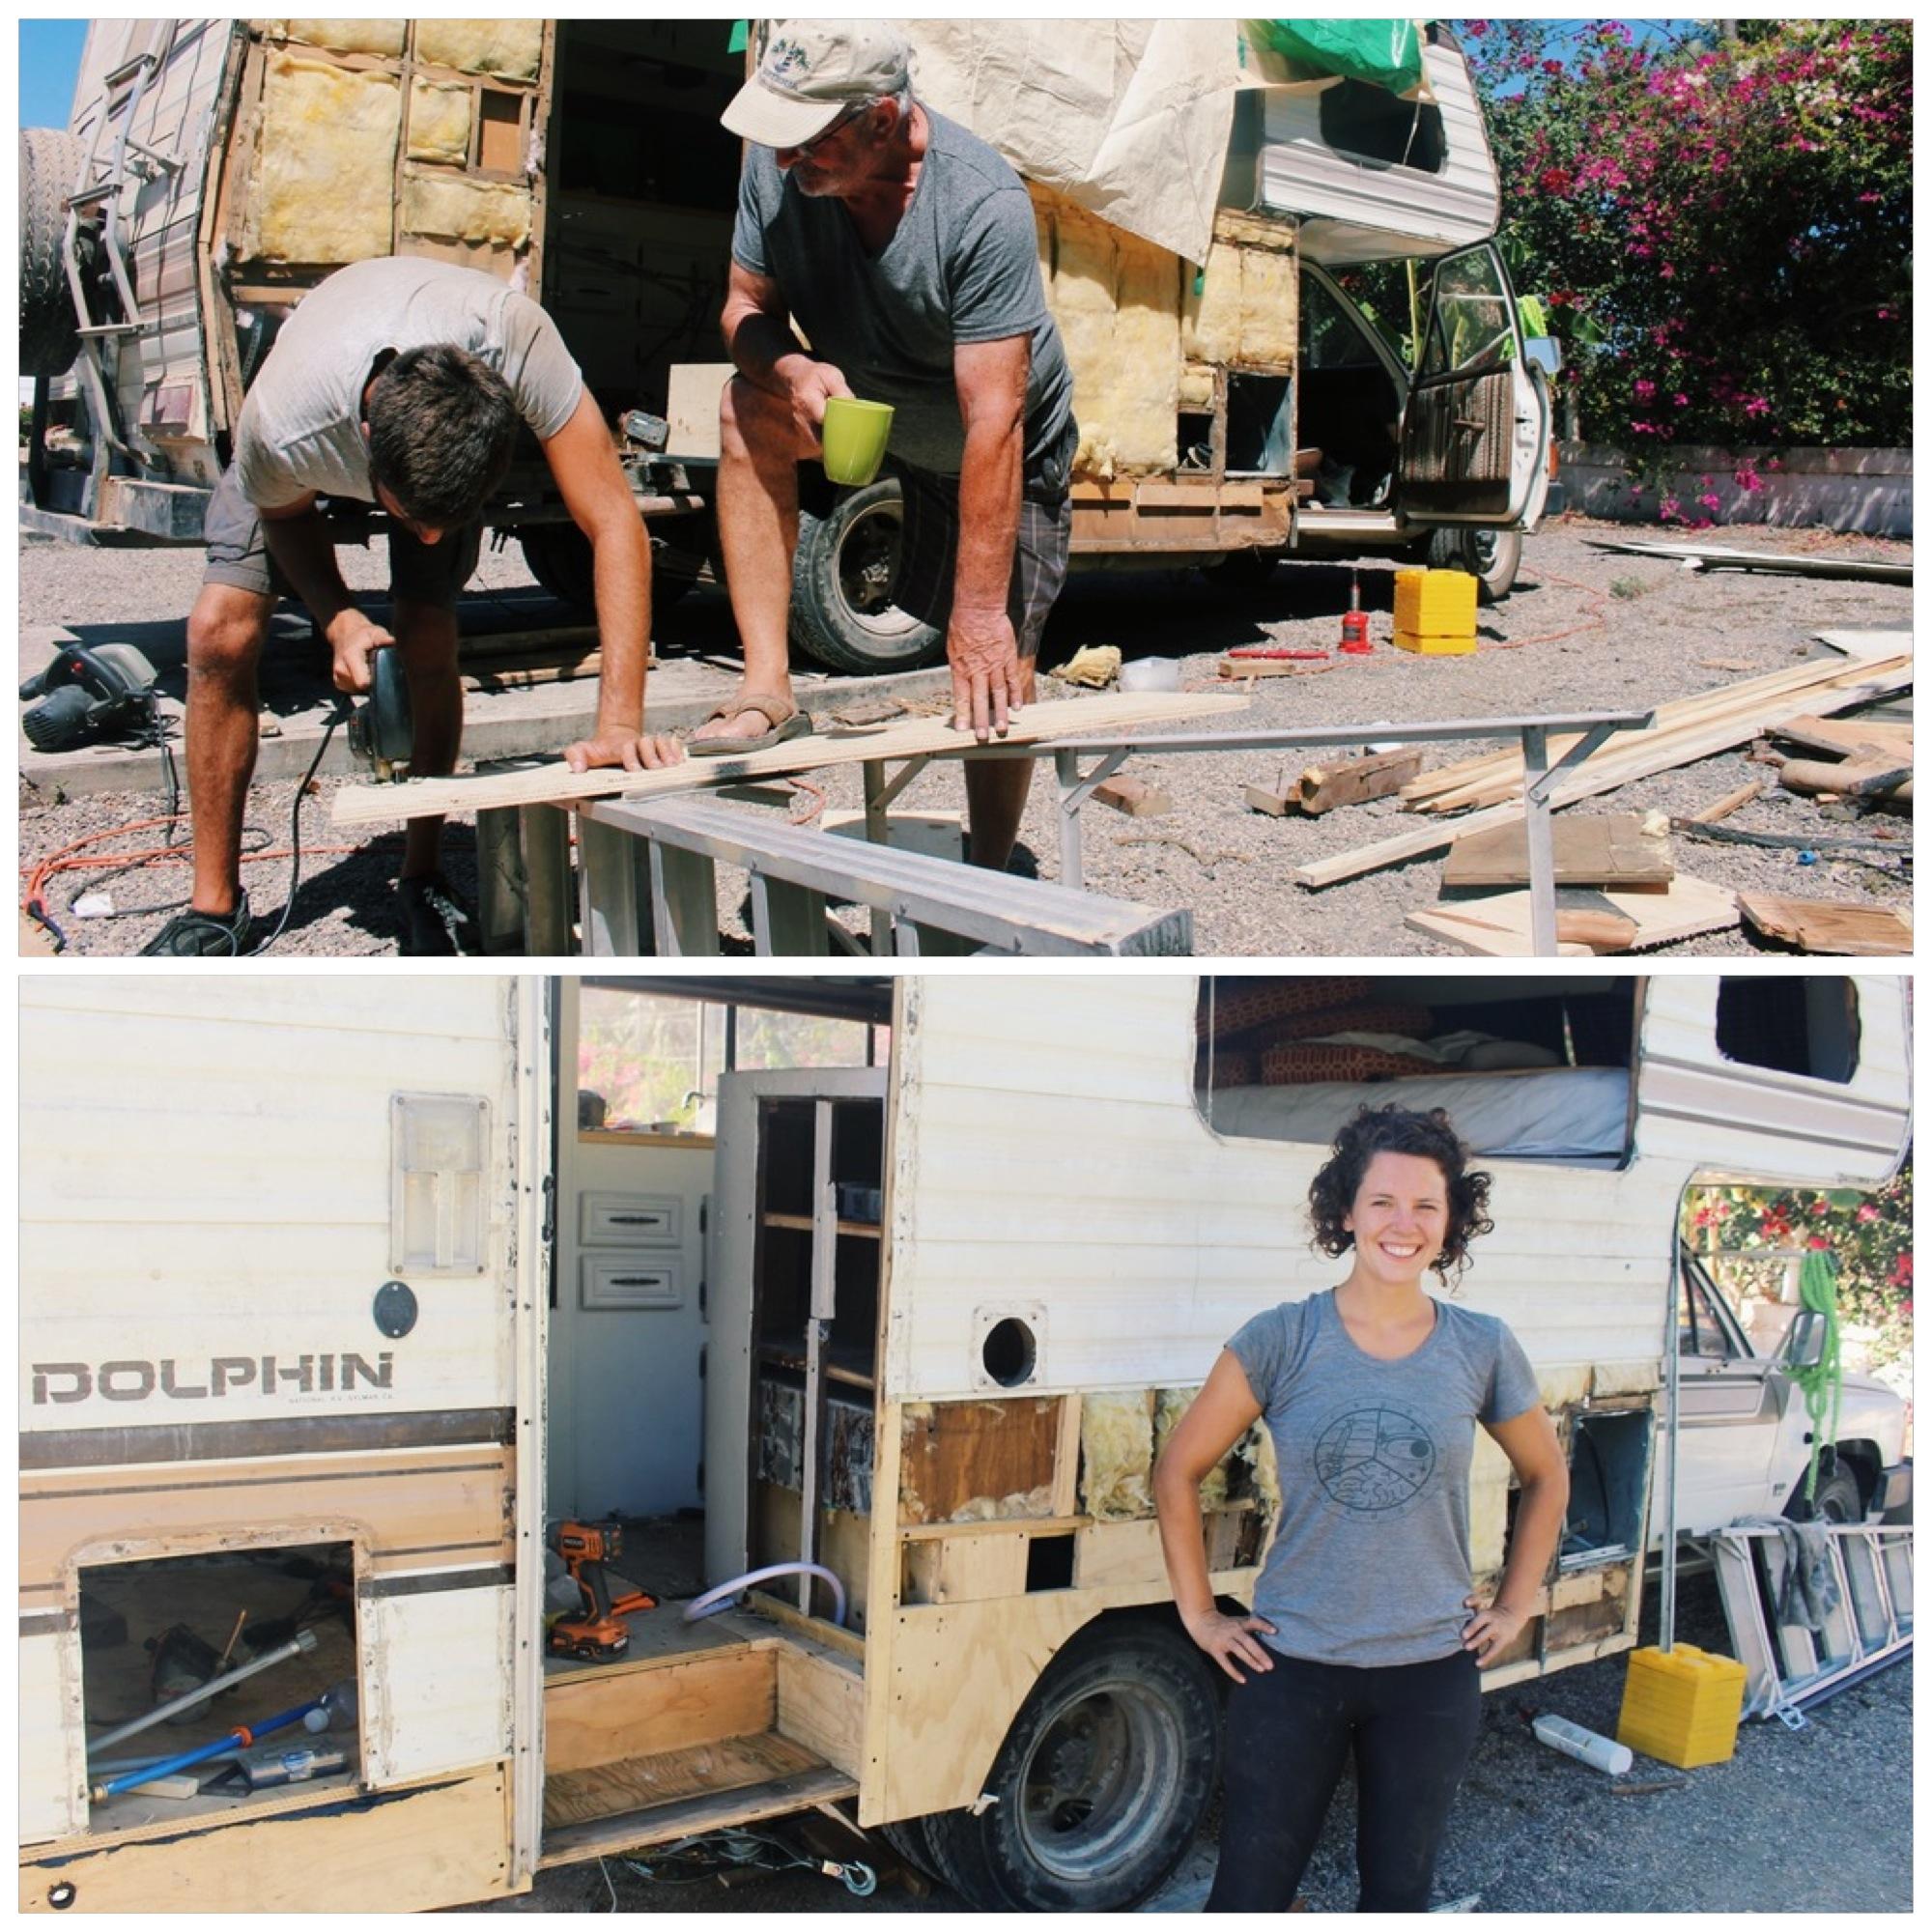 Cameron improving his carpentry skills under the tutelage of Jon. Jacqui feeling proud of the progress!